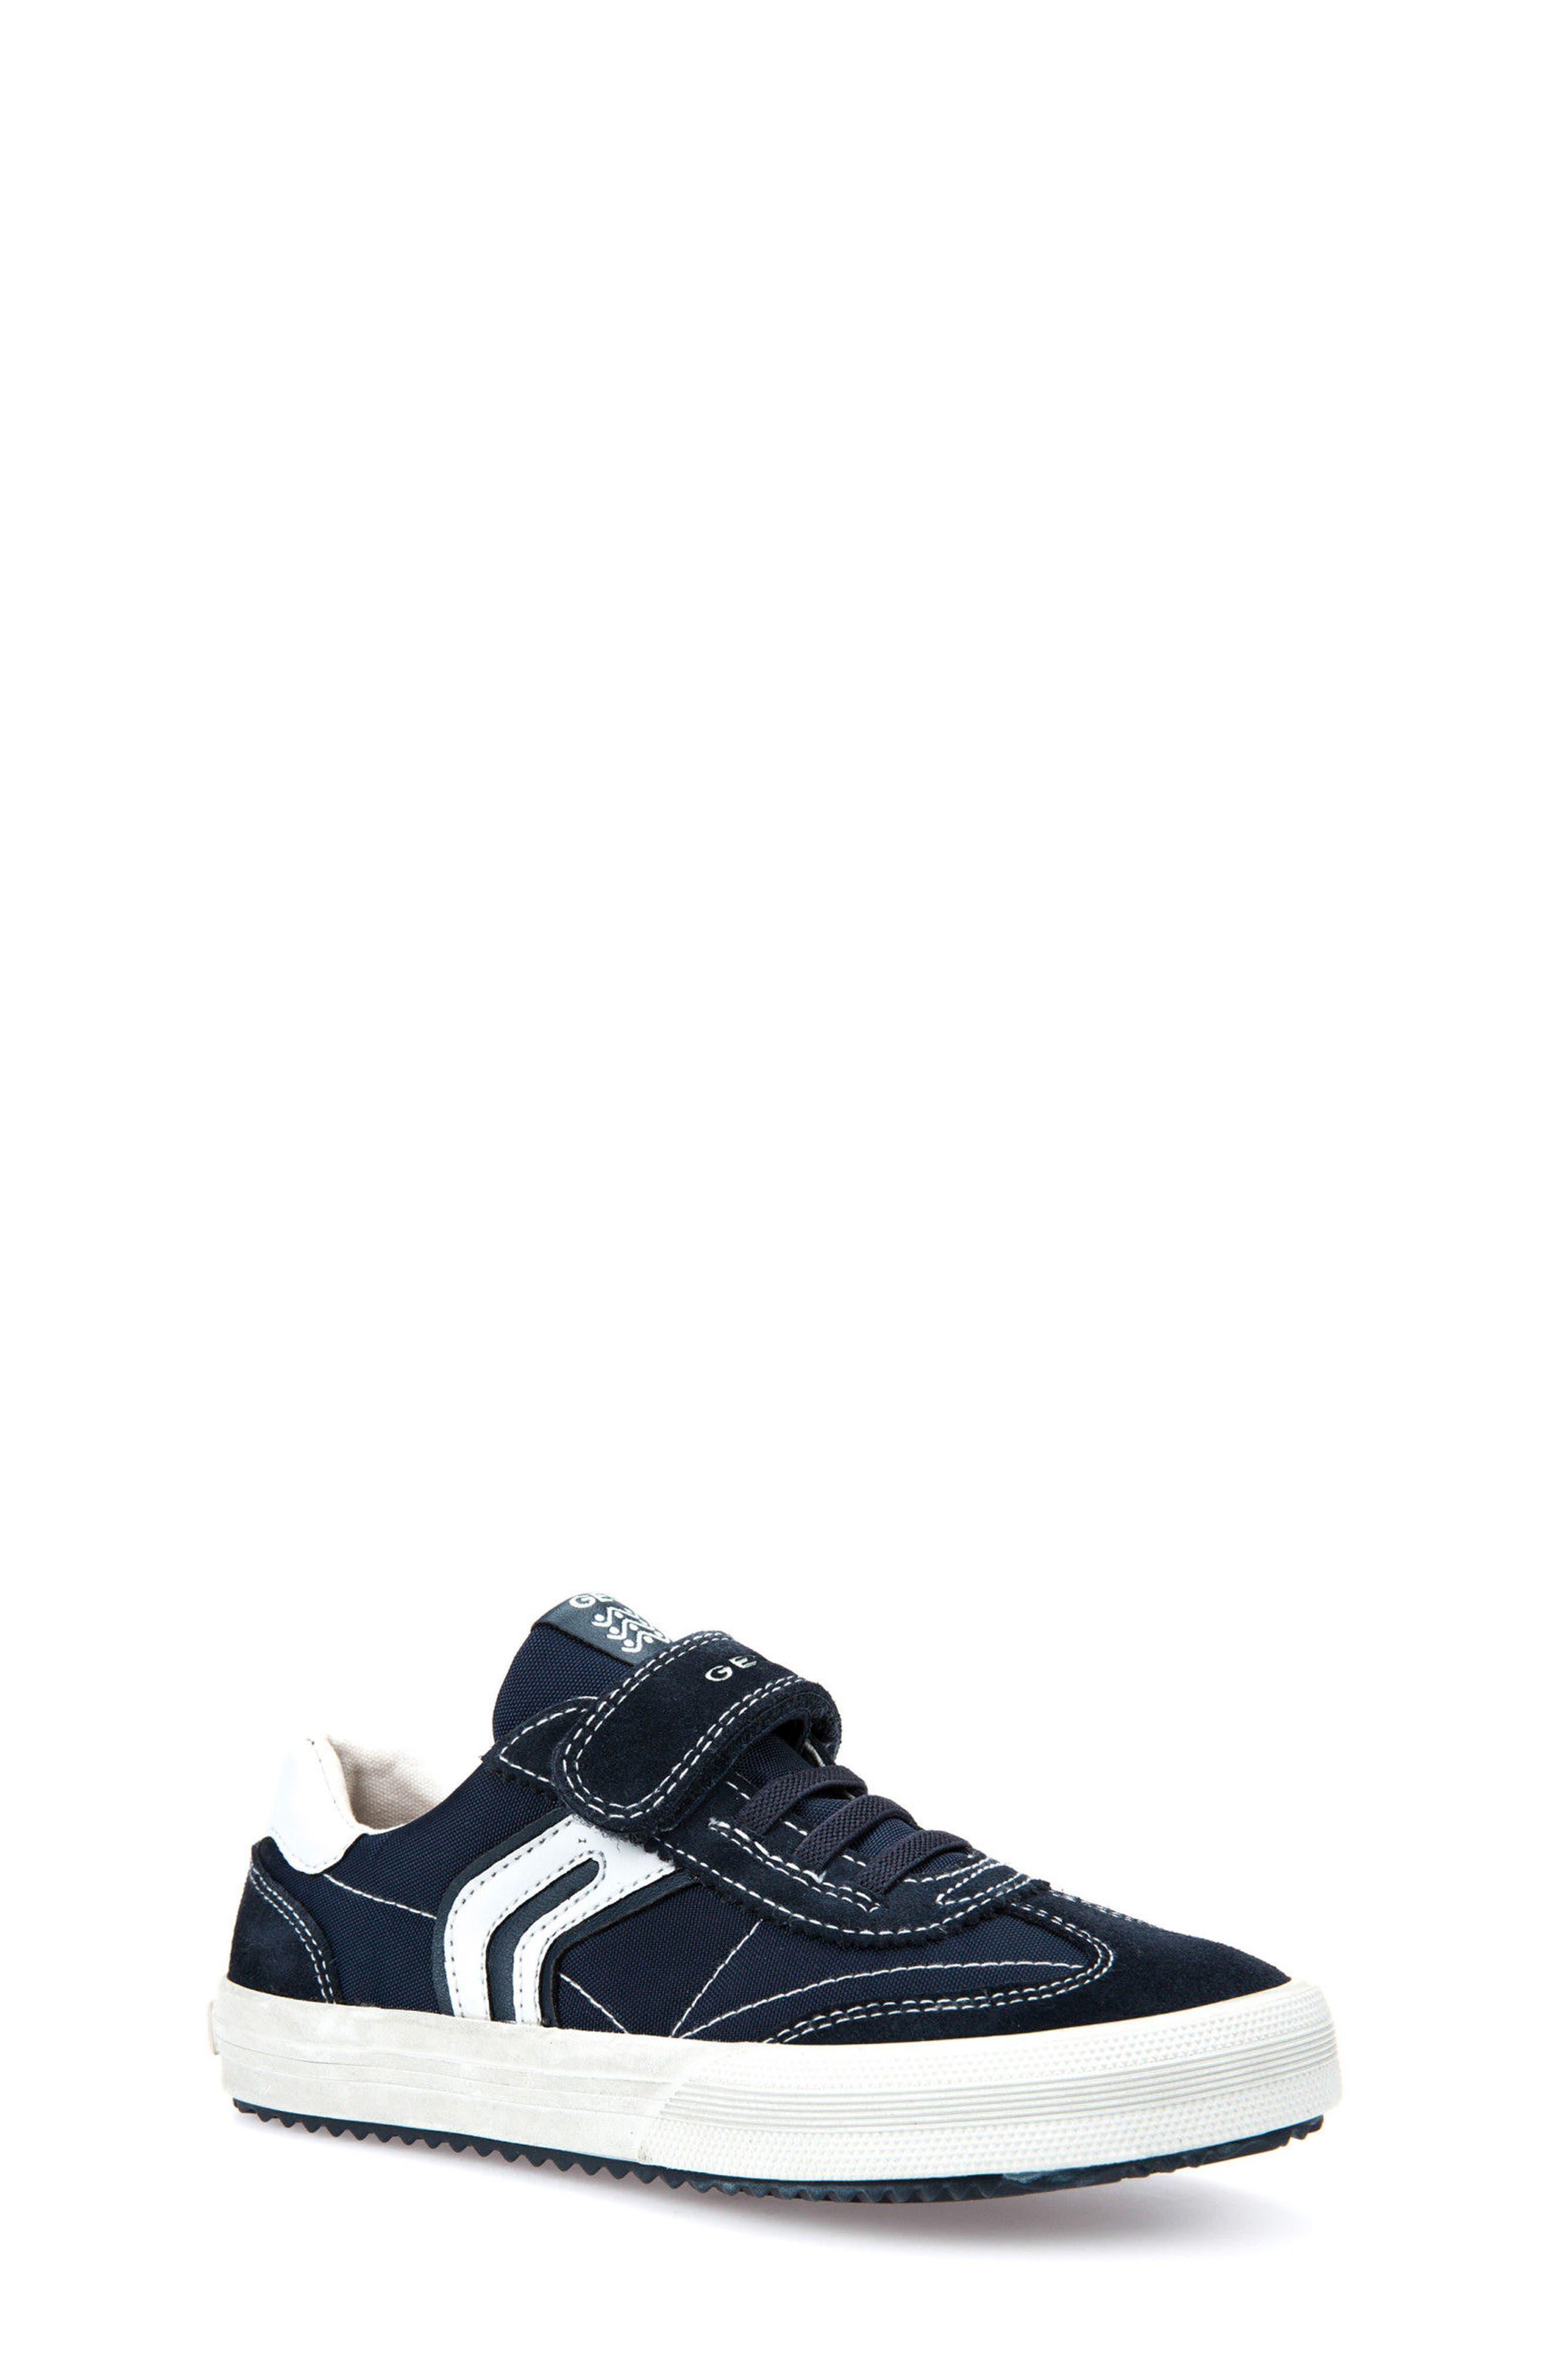 Alonisso Low Top Sneaker,                         Main,                         color, NAVY/ GREY